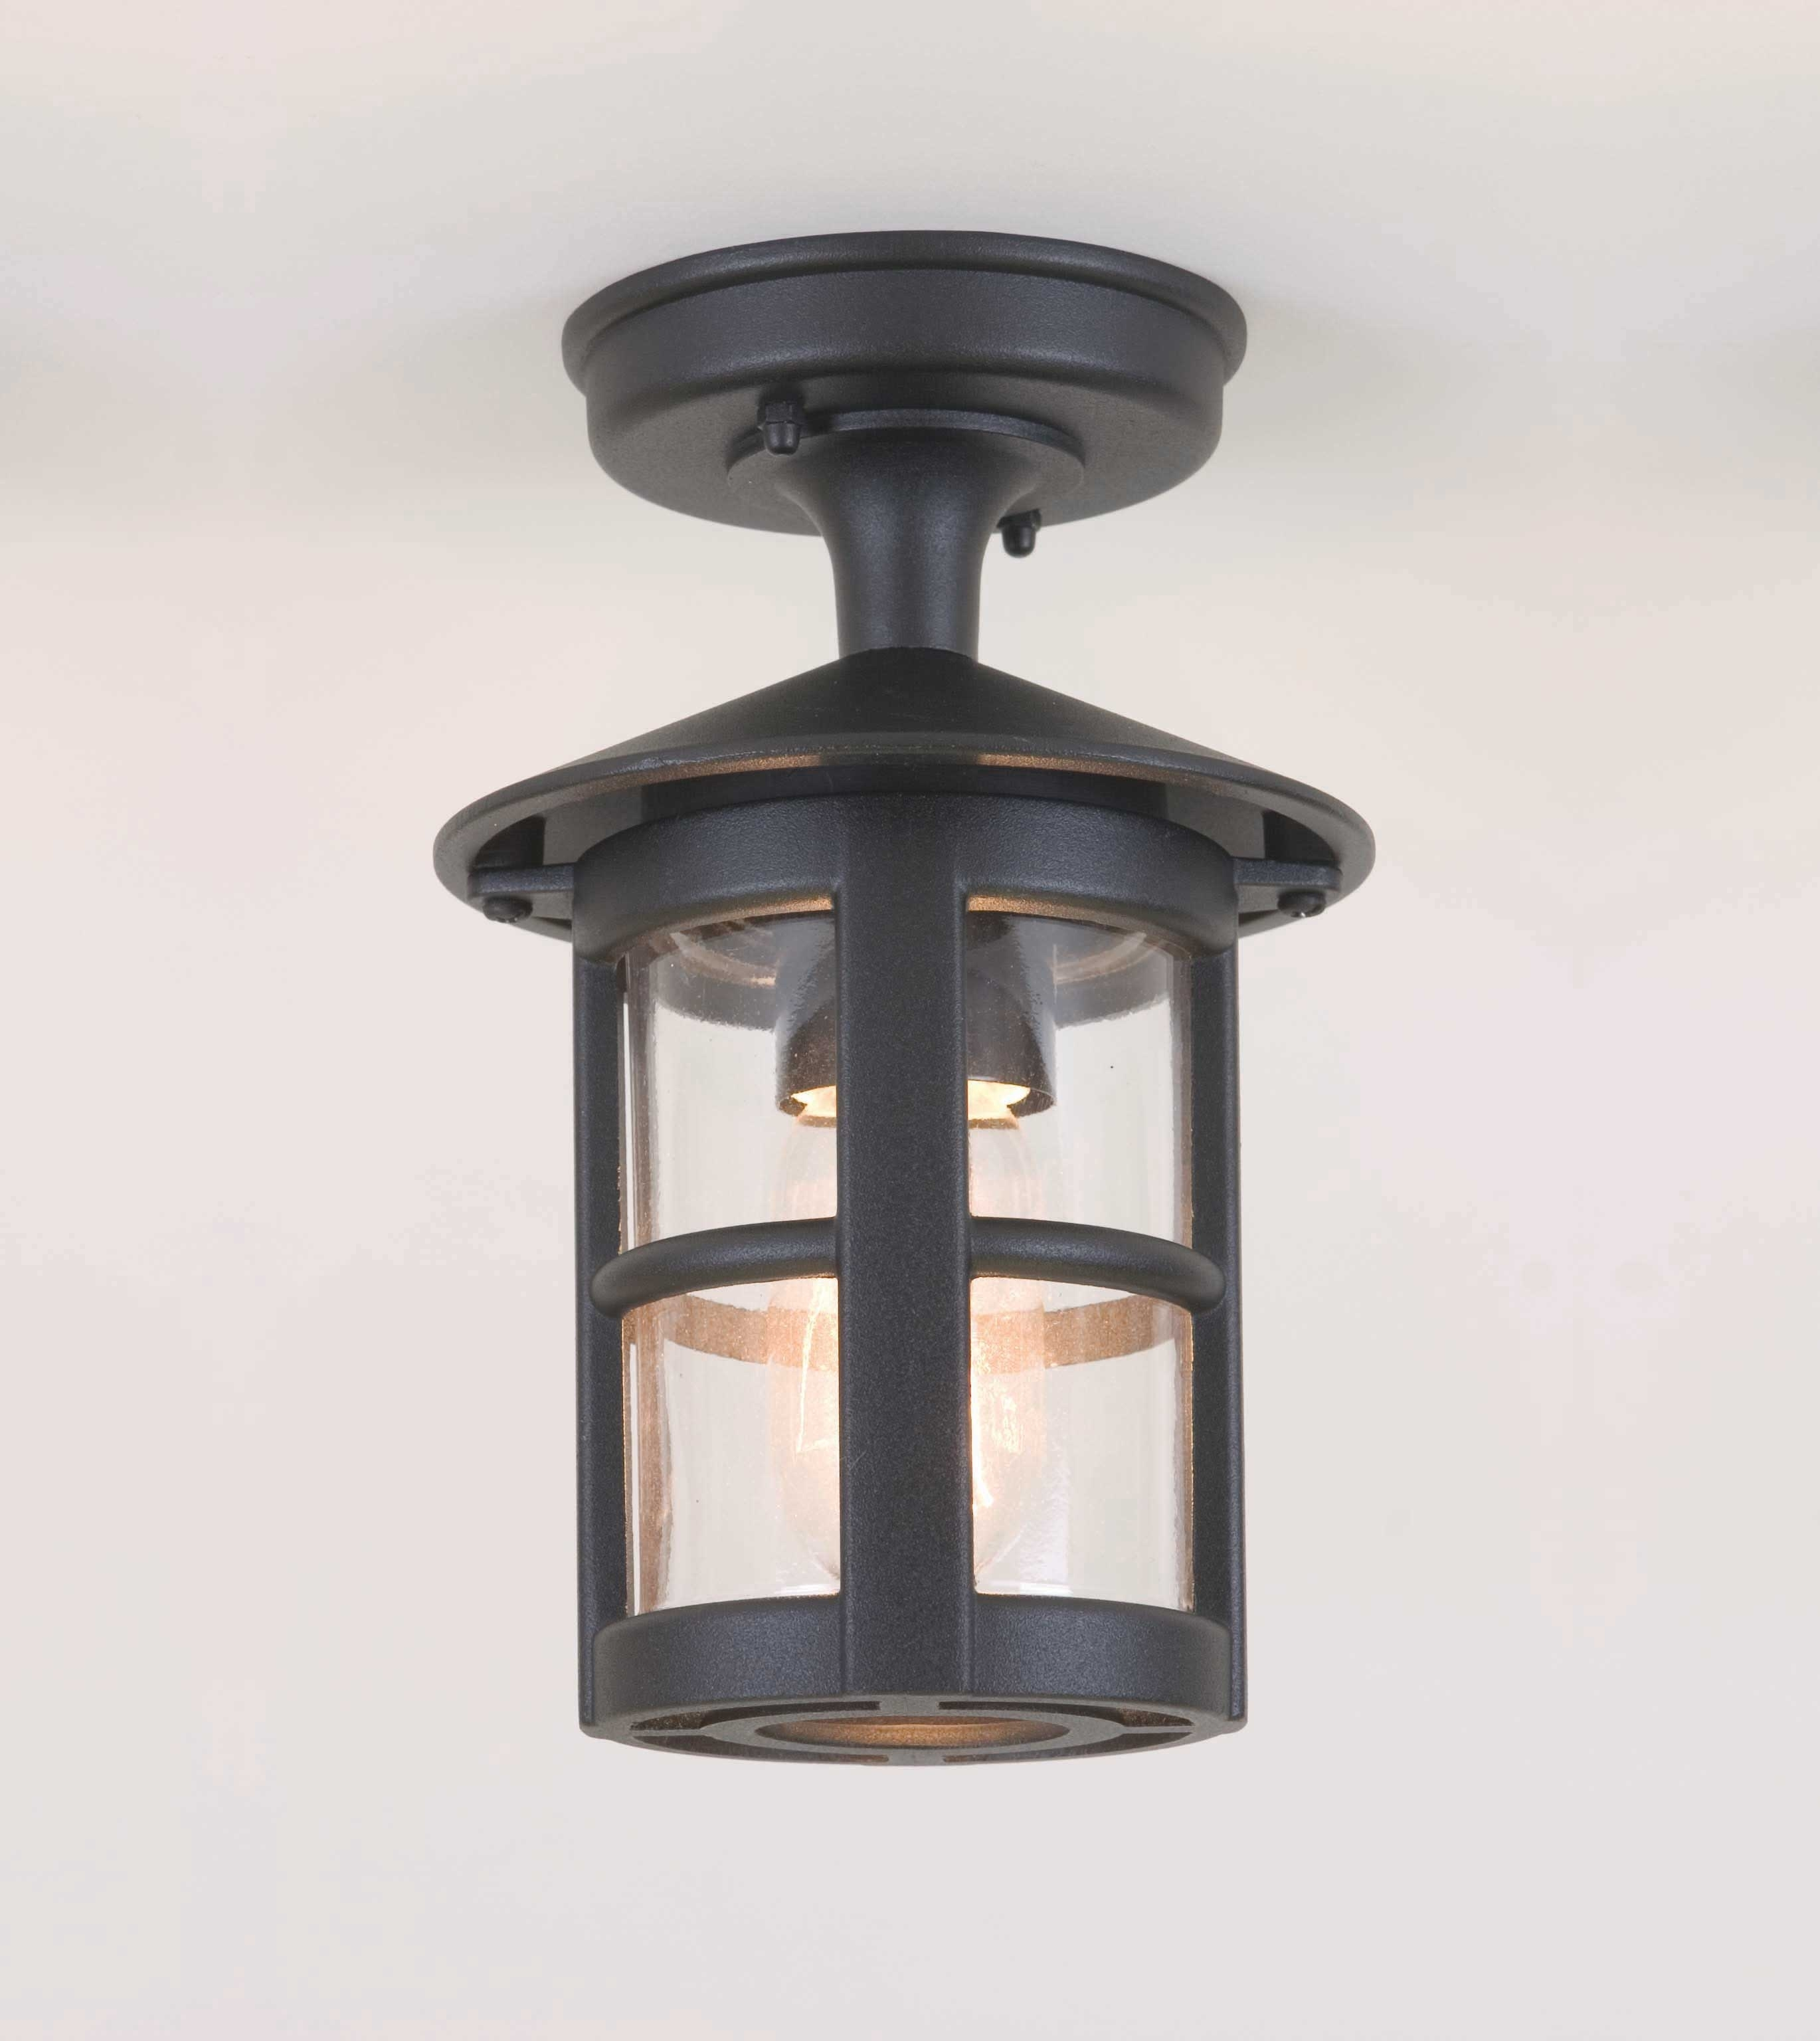 Diy : Top Outdoor Porch Ceiling Lights Warisan Lighting Patio Light In Diy Outdoor Ceiling Lights (#9 of 15)